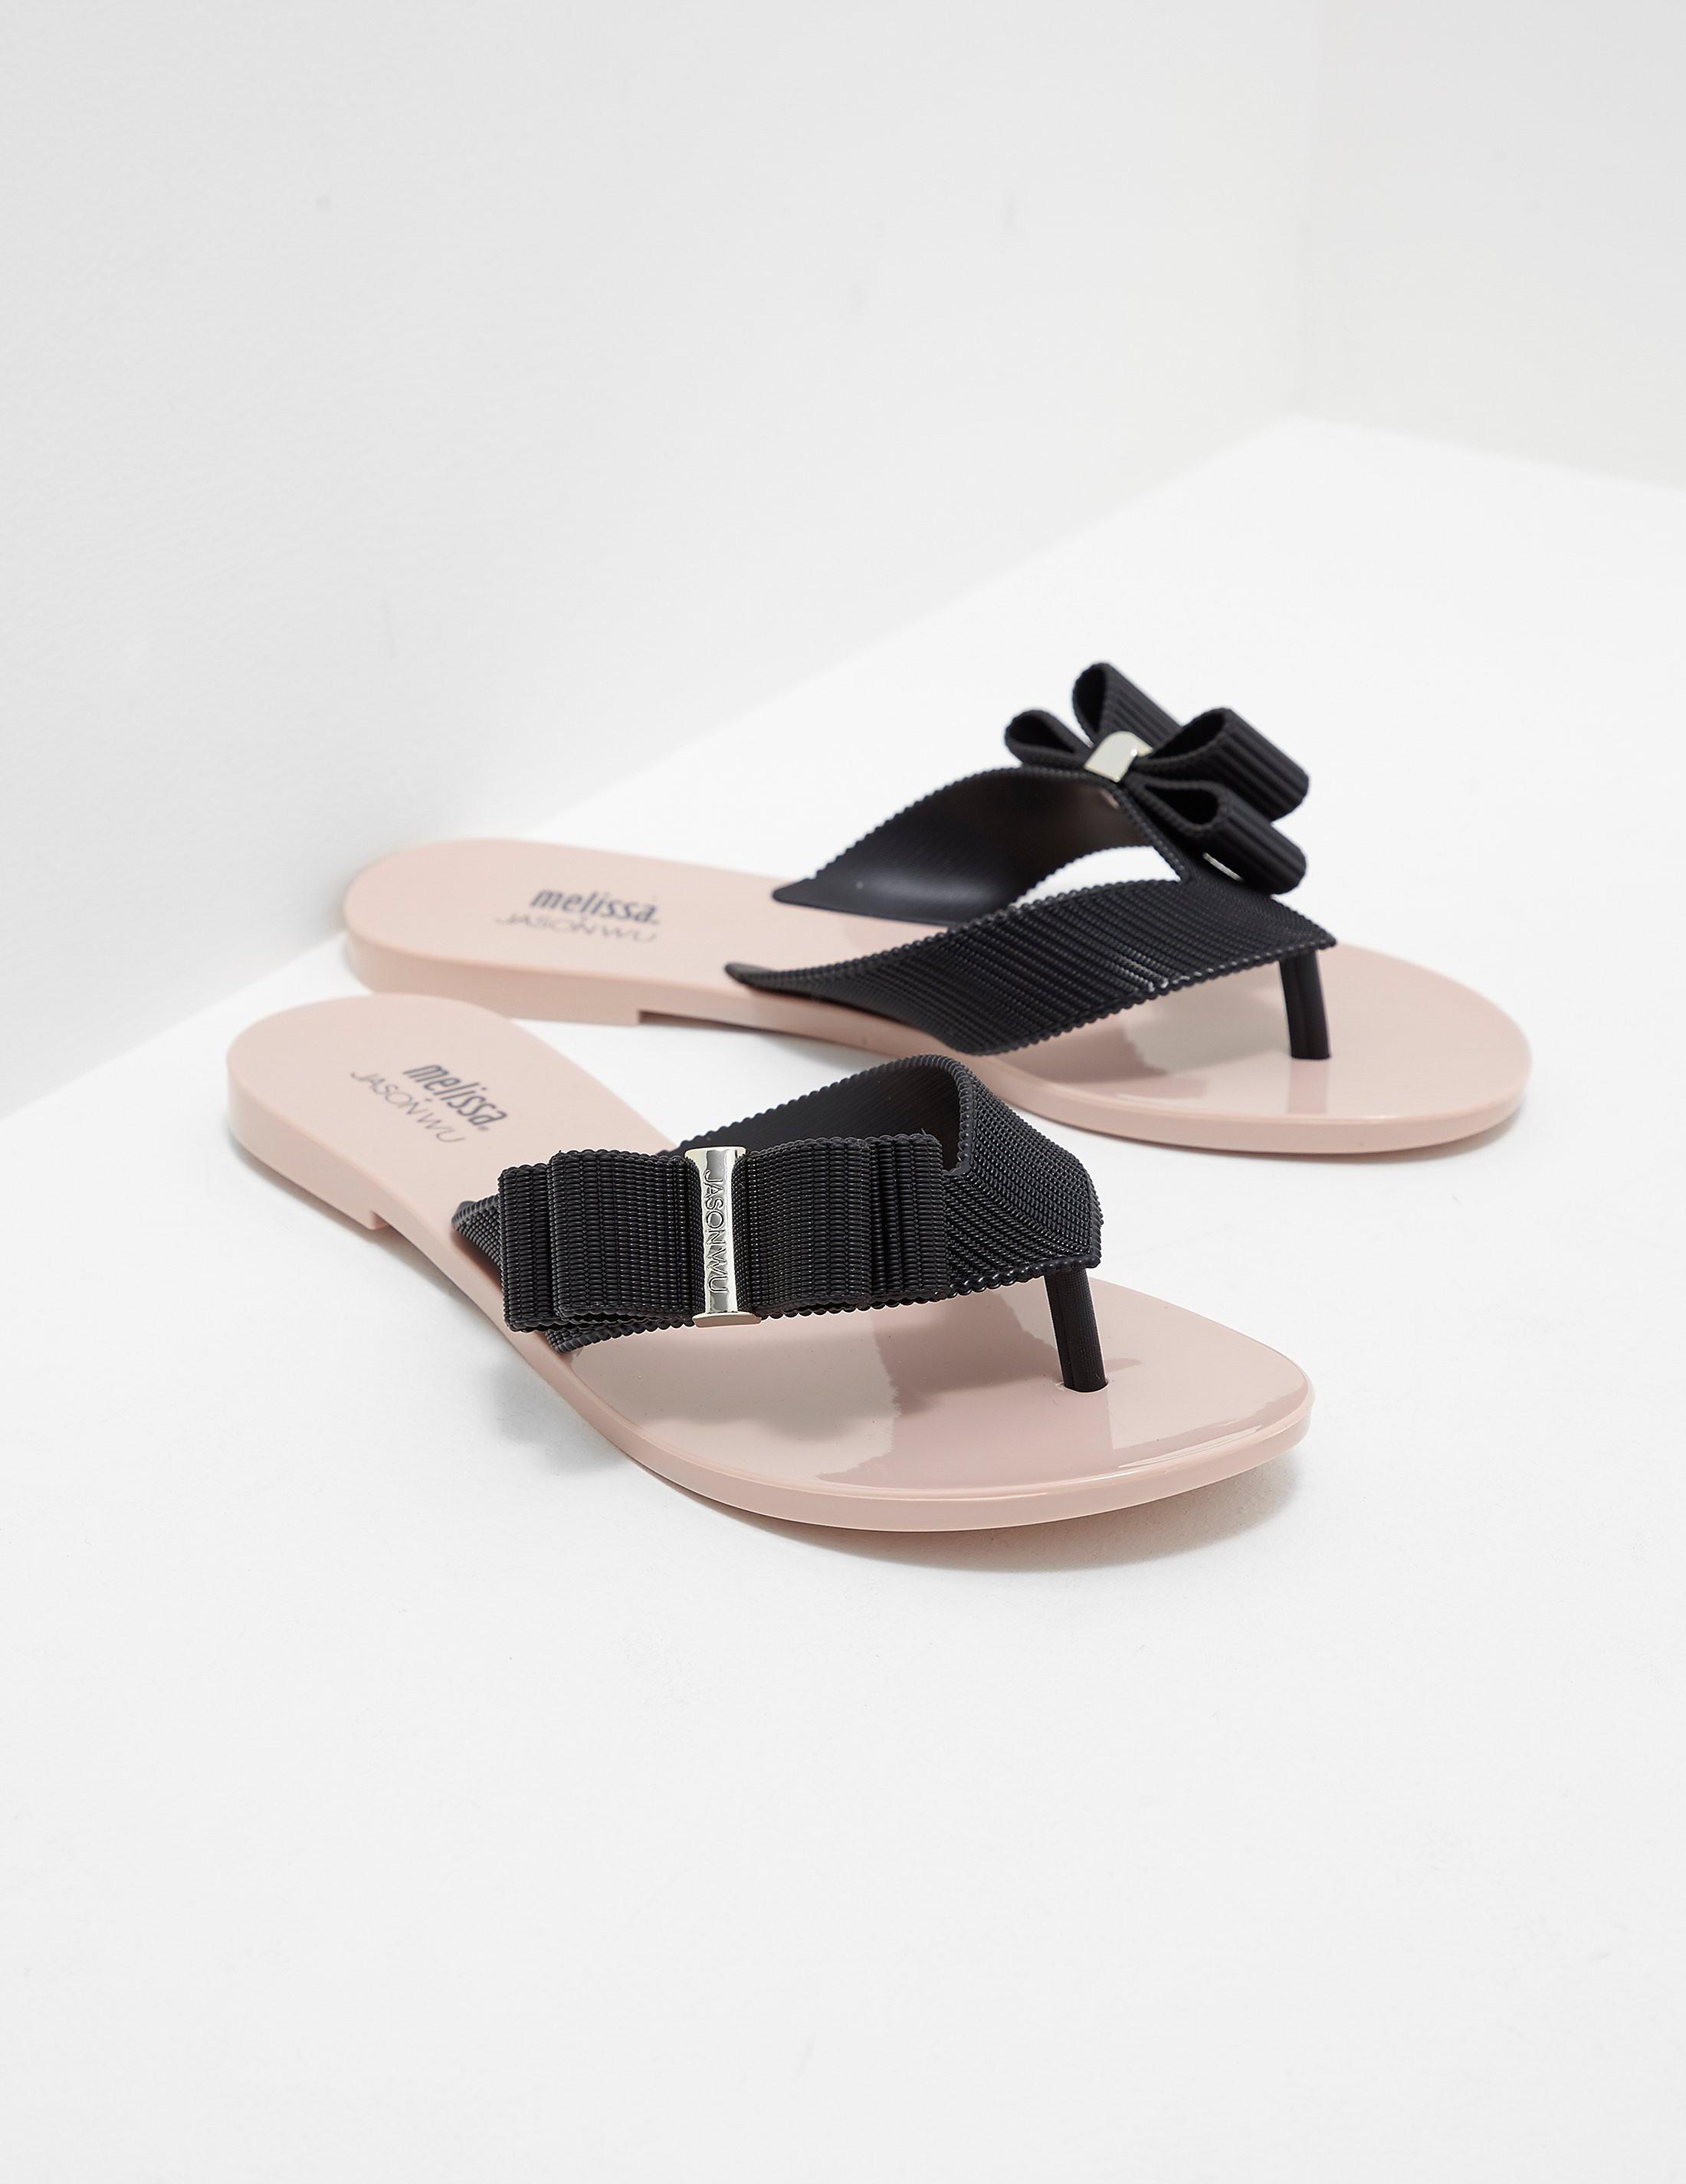 Melissa x Jason Wu Contrast Sandals